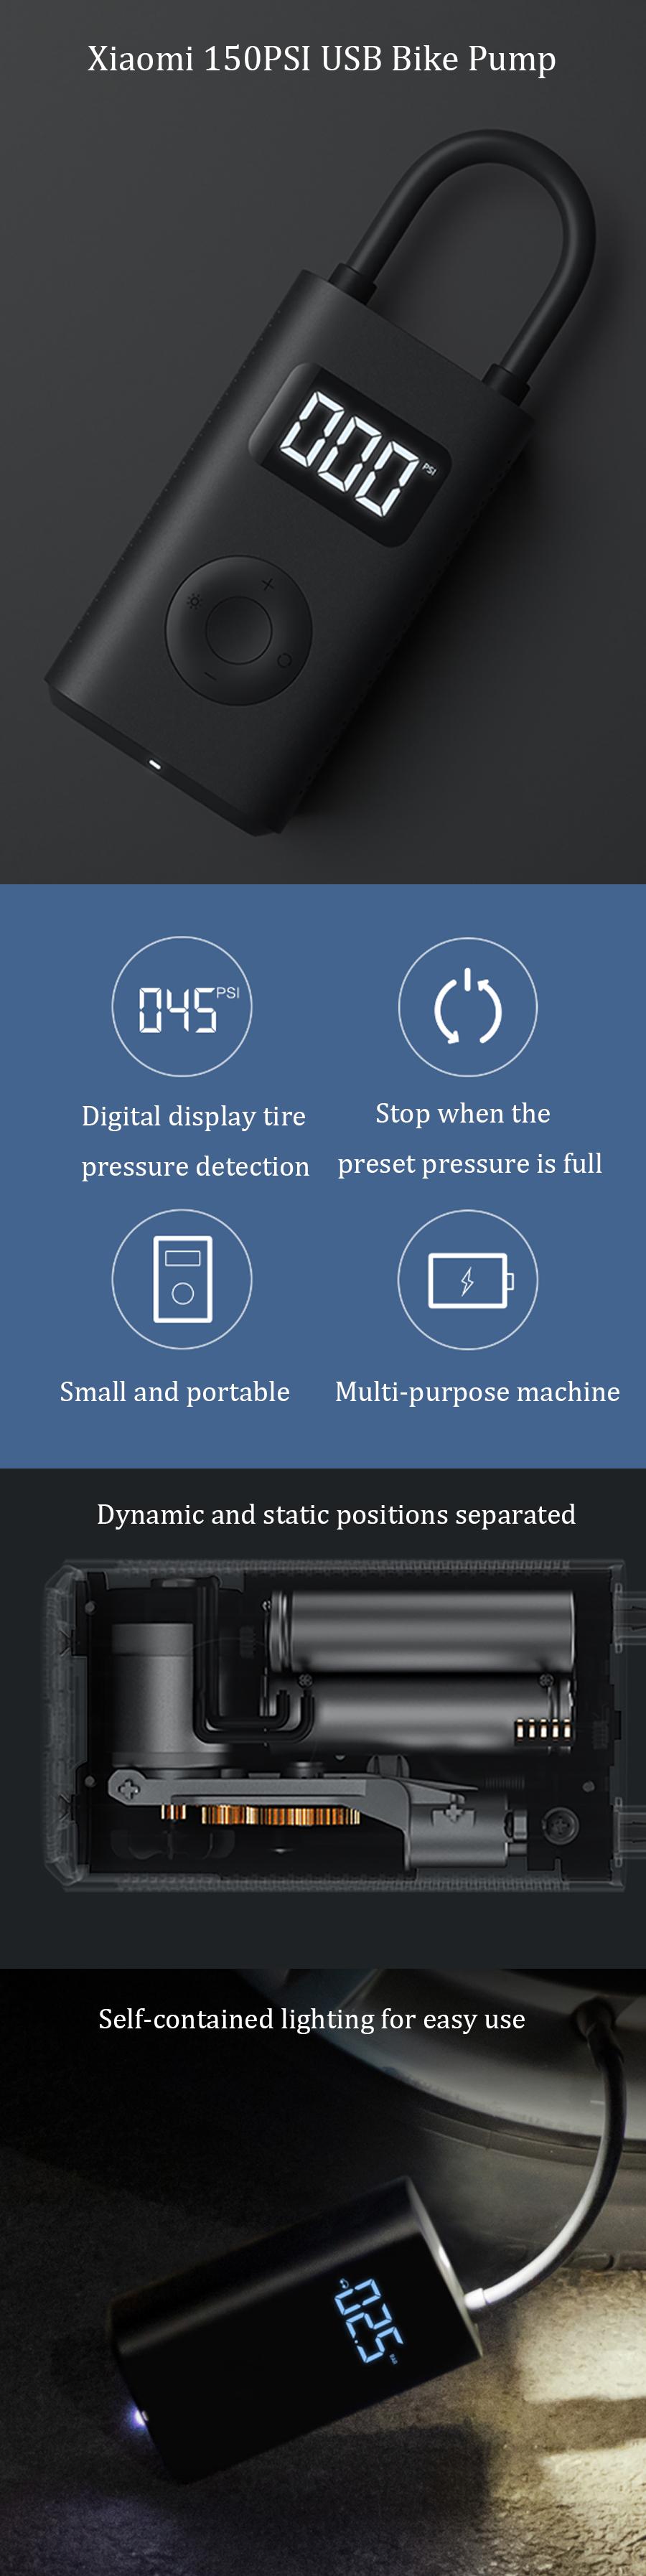 Xiaomi 5V 150PSI Portable Bike Pump USB Charging Electric Air Pump Camping Cycling